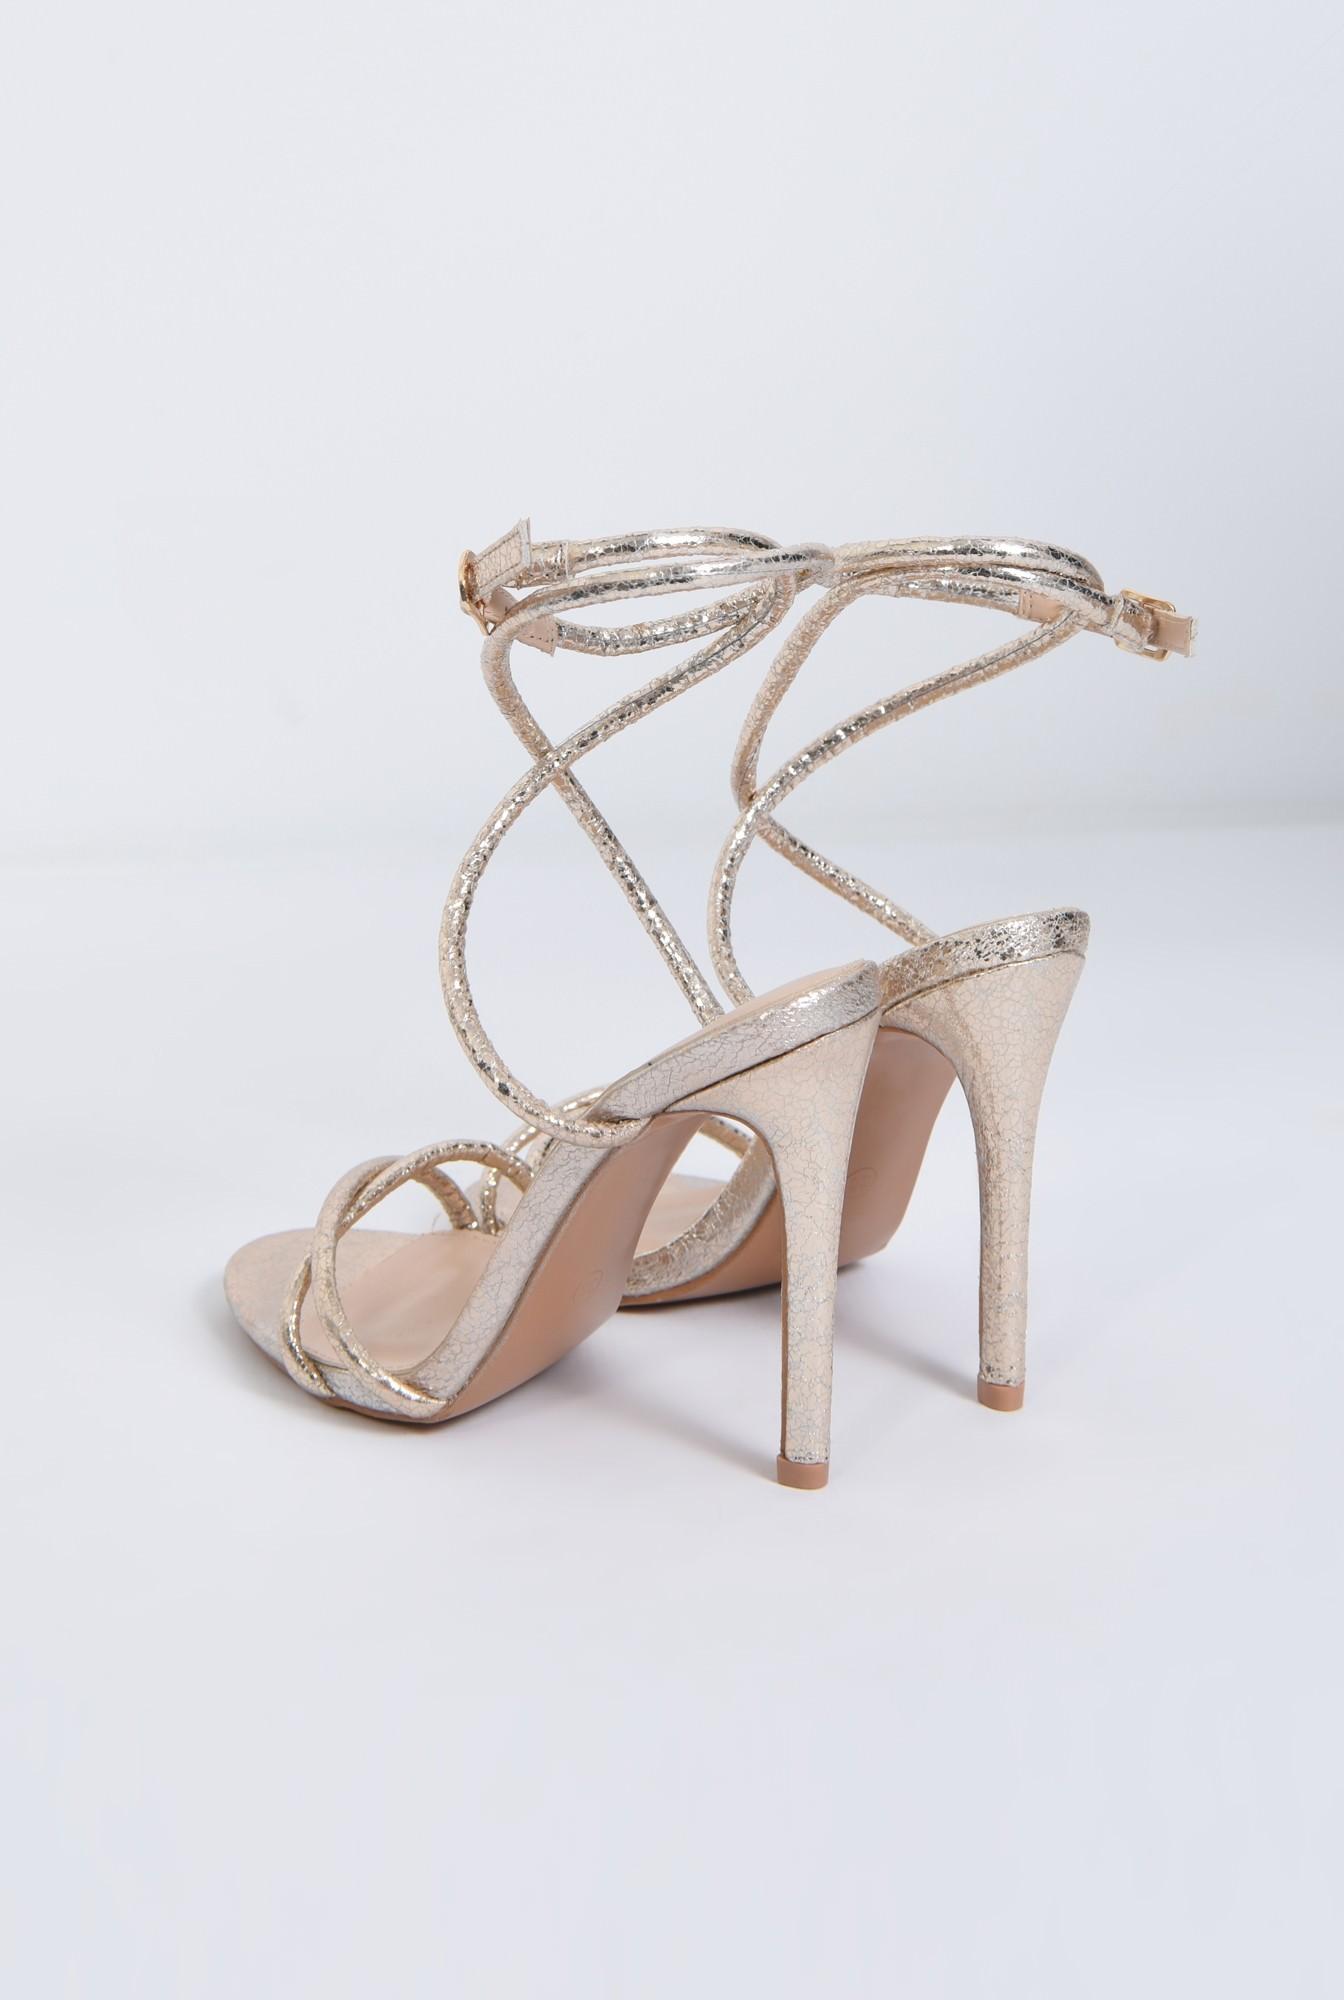 4 - sandale de ocazie, barete subtiri, toc inalt